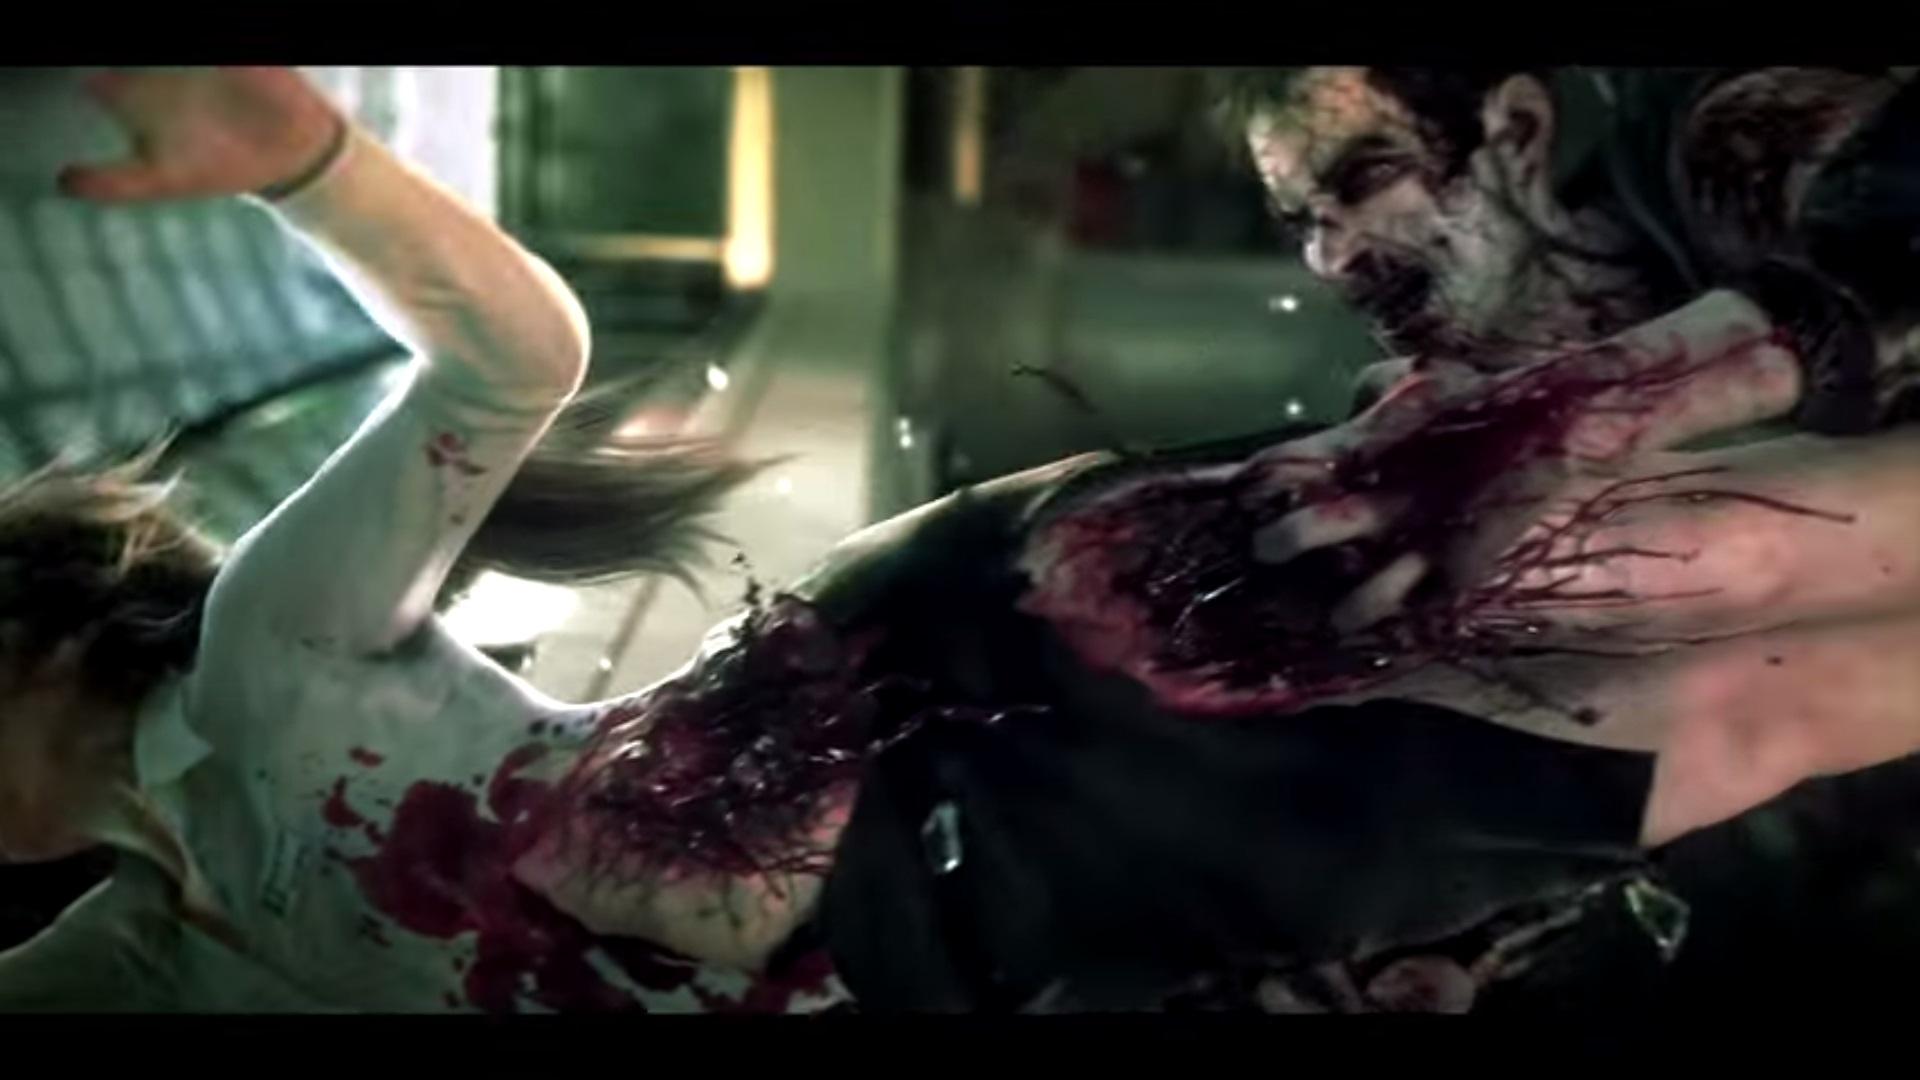 wiiu-zombiu-announced-for-ps4-xbox-one-pc-001